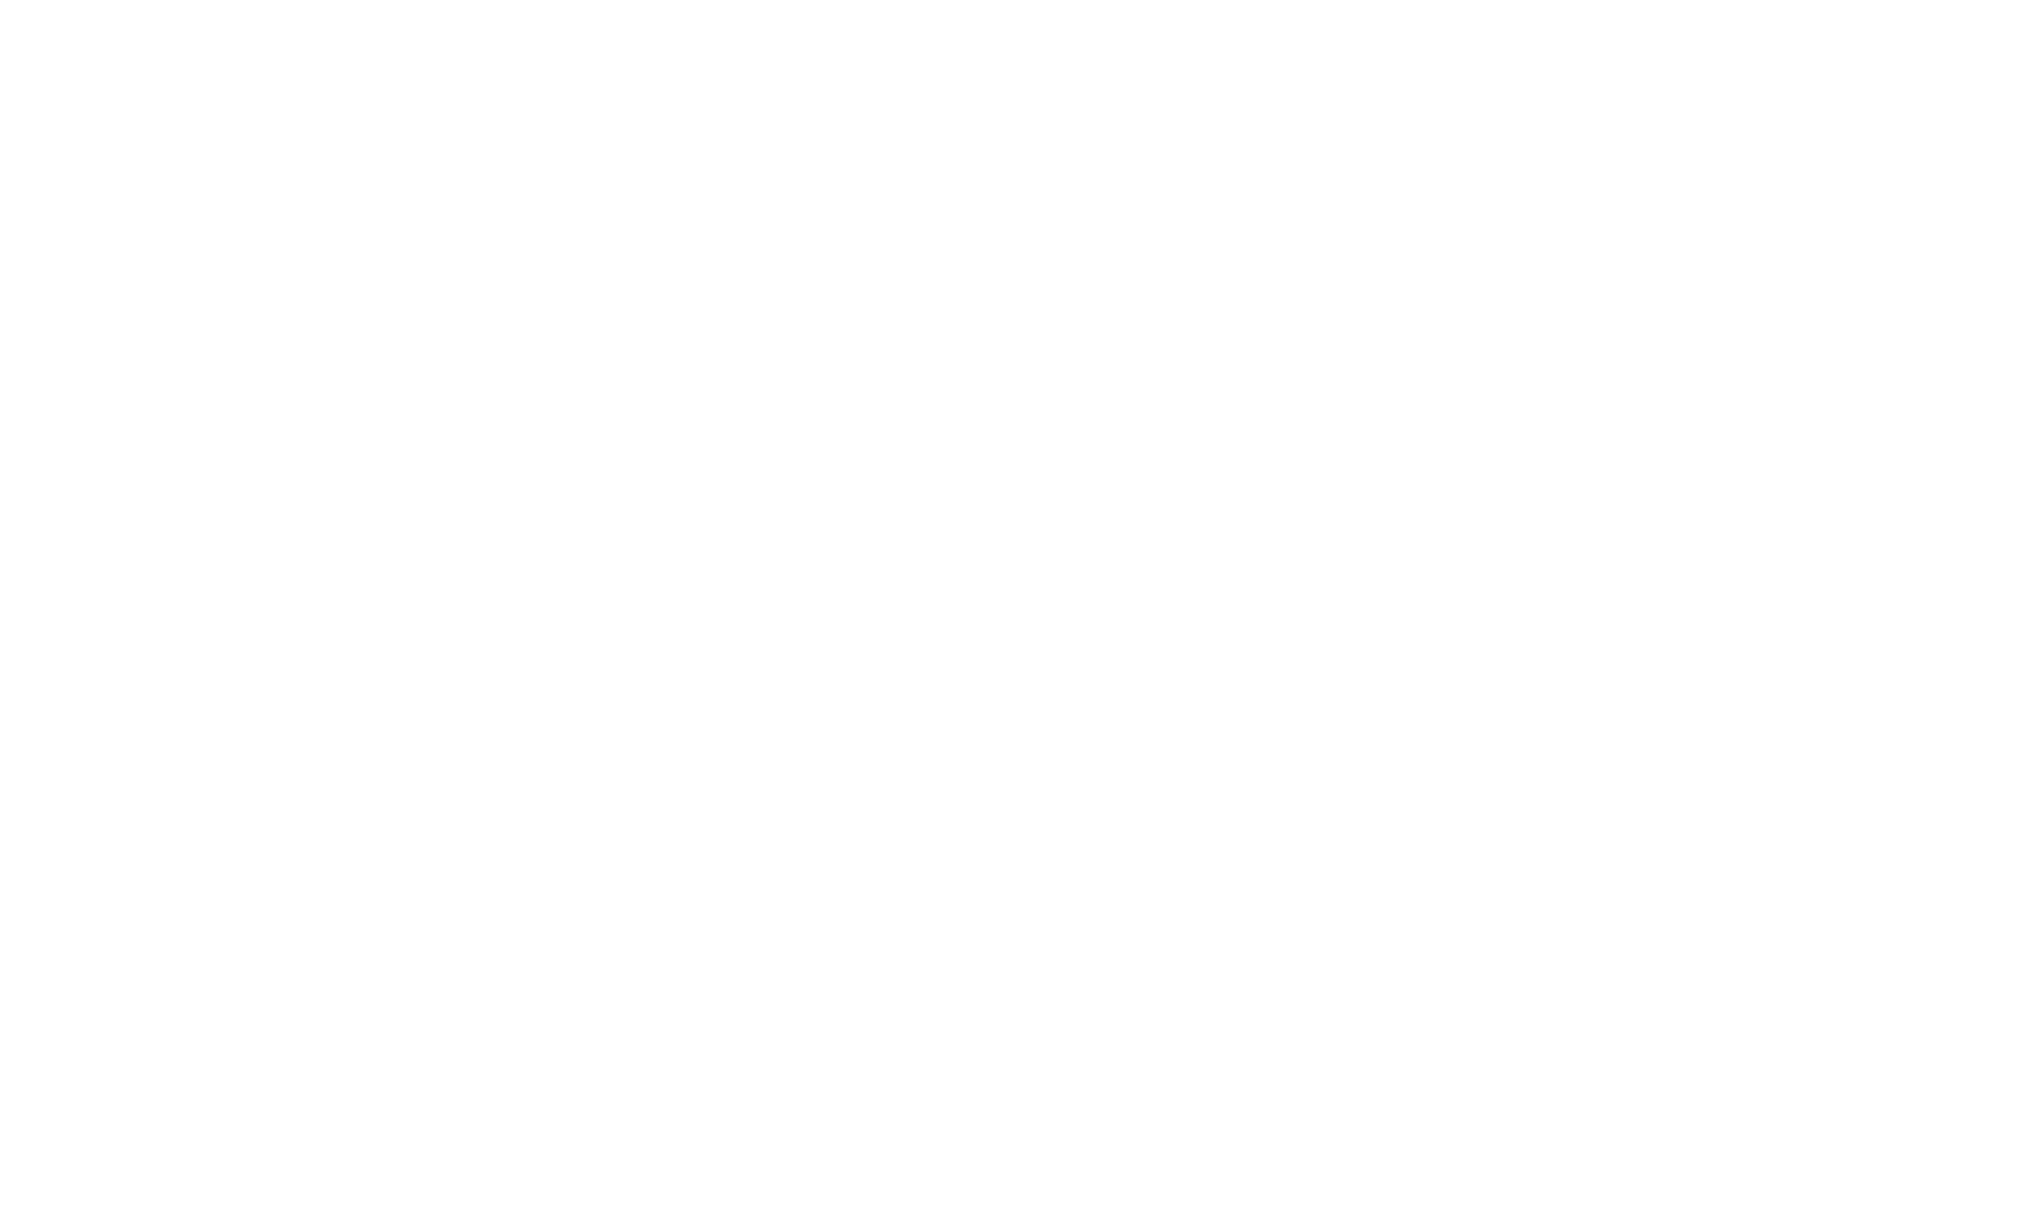 msq18-frame.png